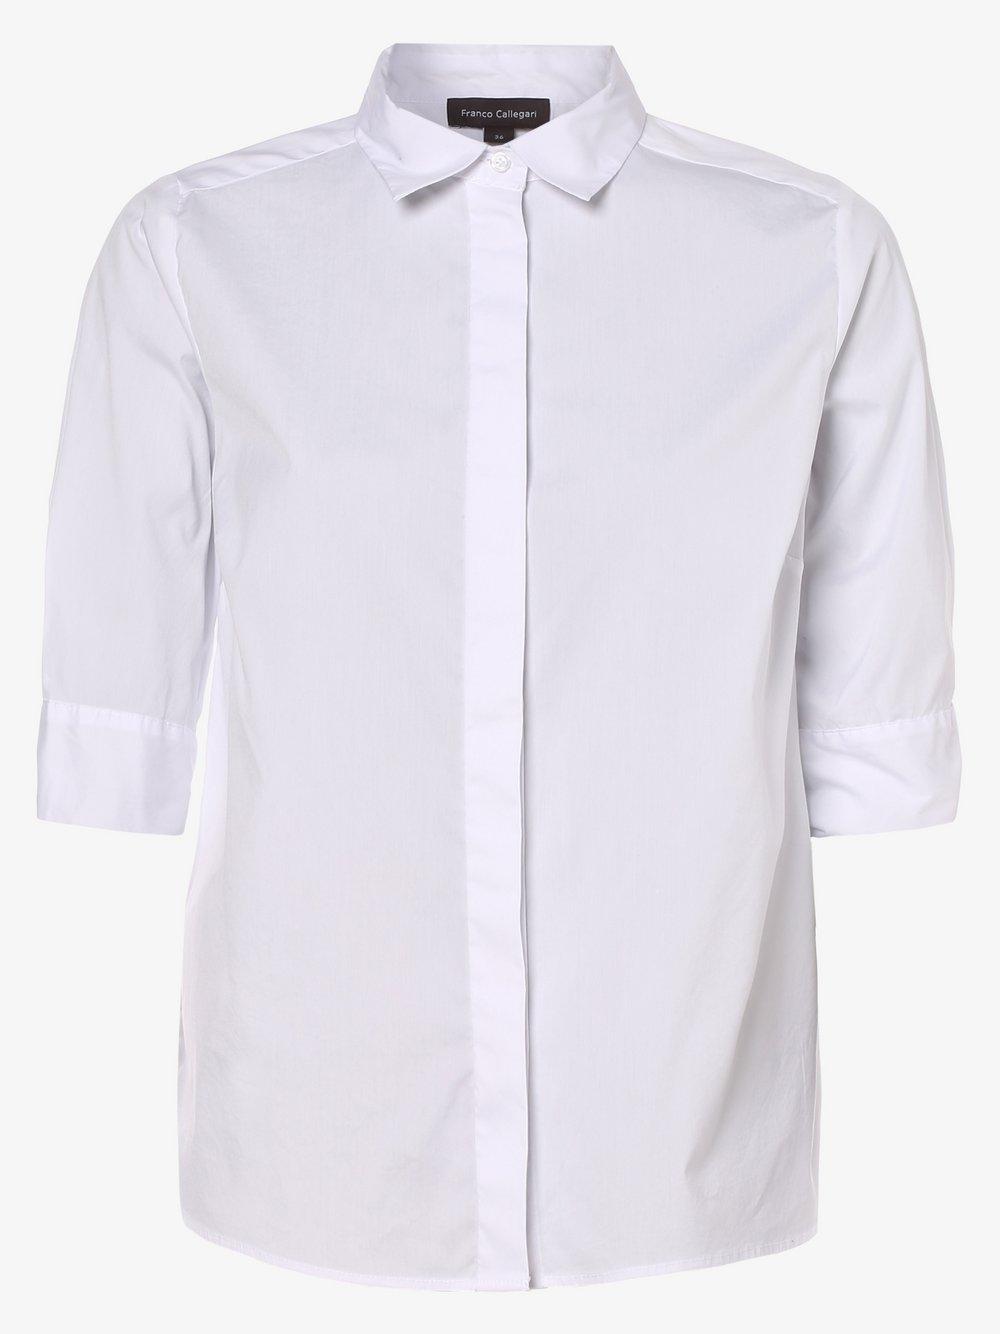 Franco Callegari – Bluzka damska, biały Van Graaf 464331-0001-00420